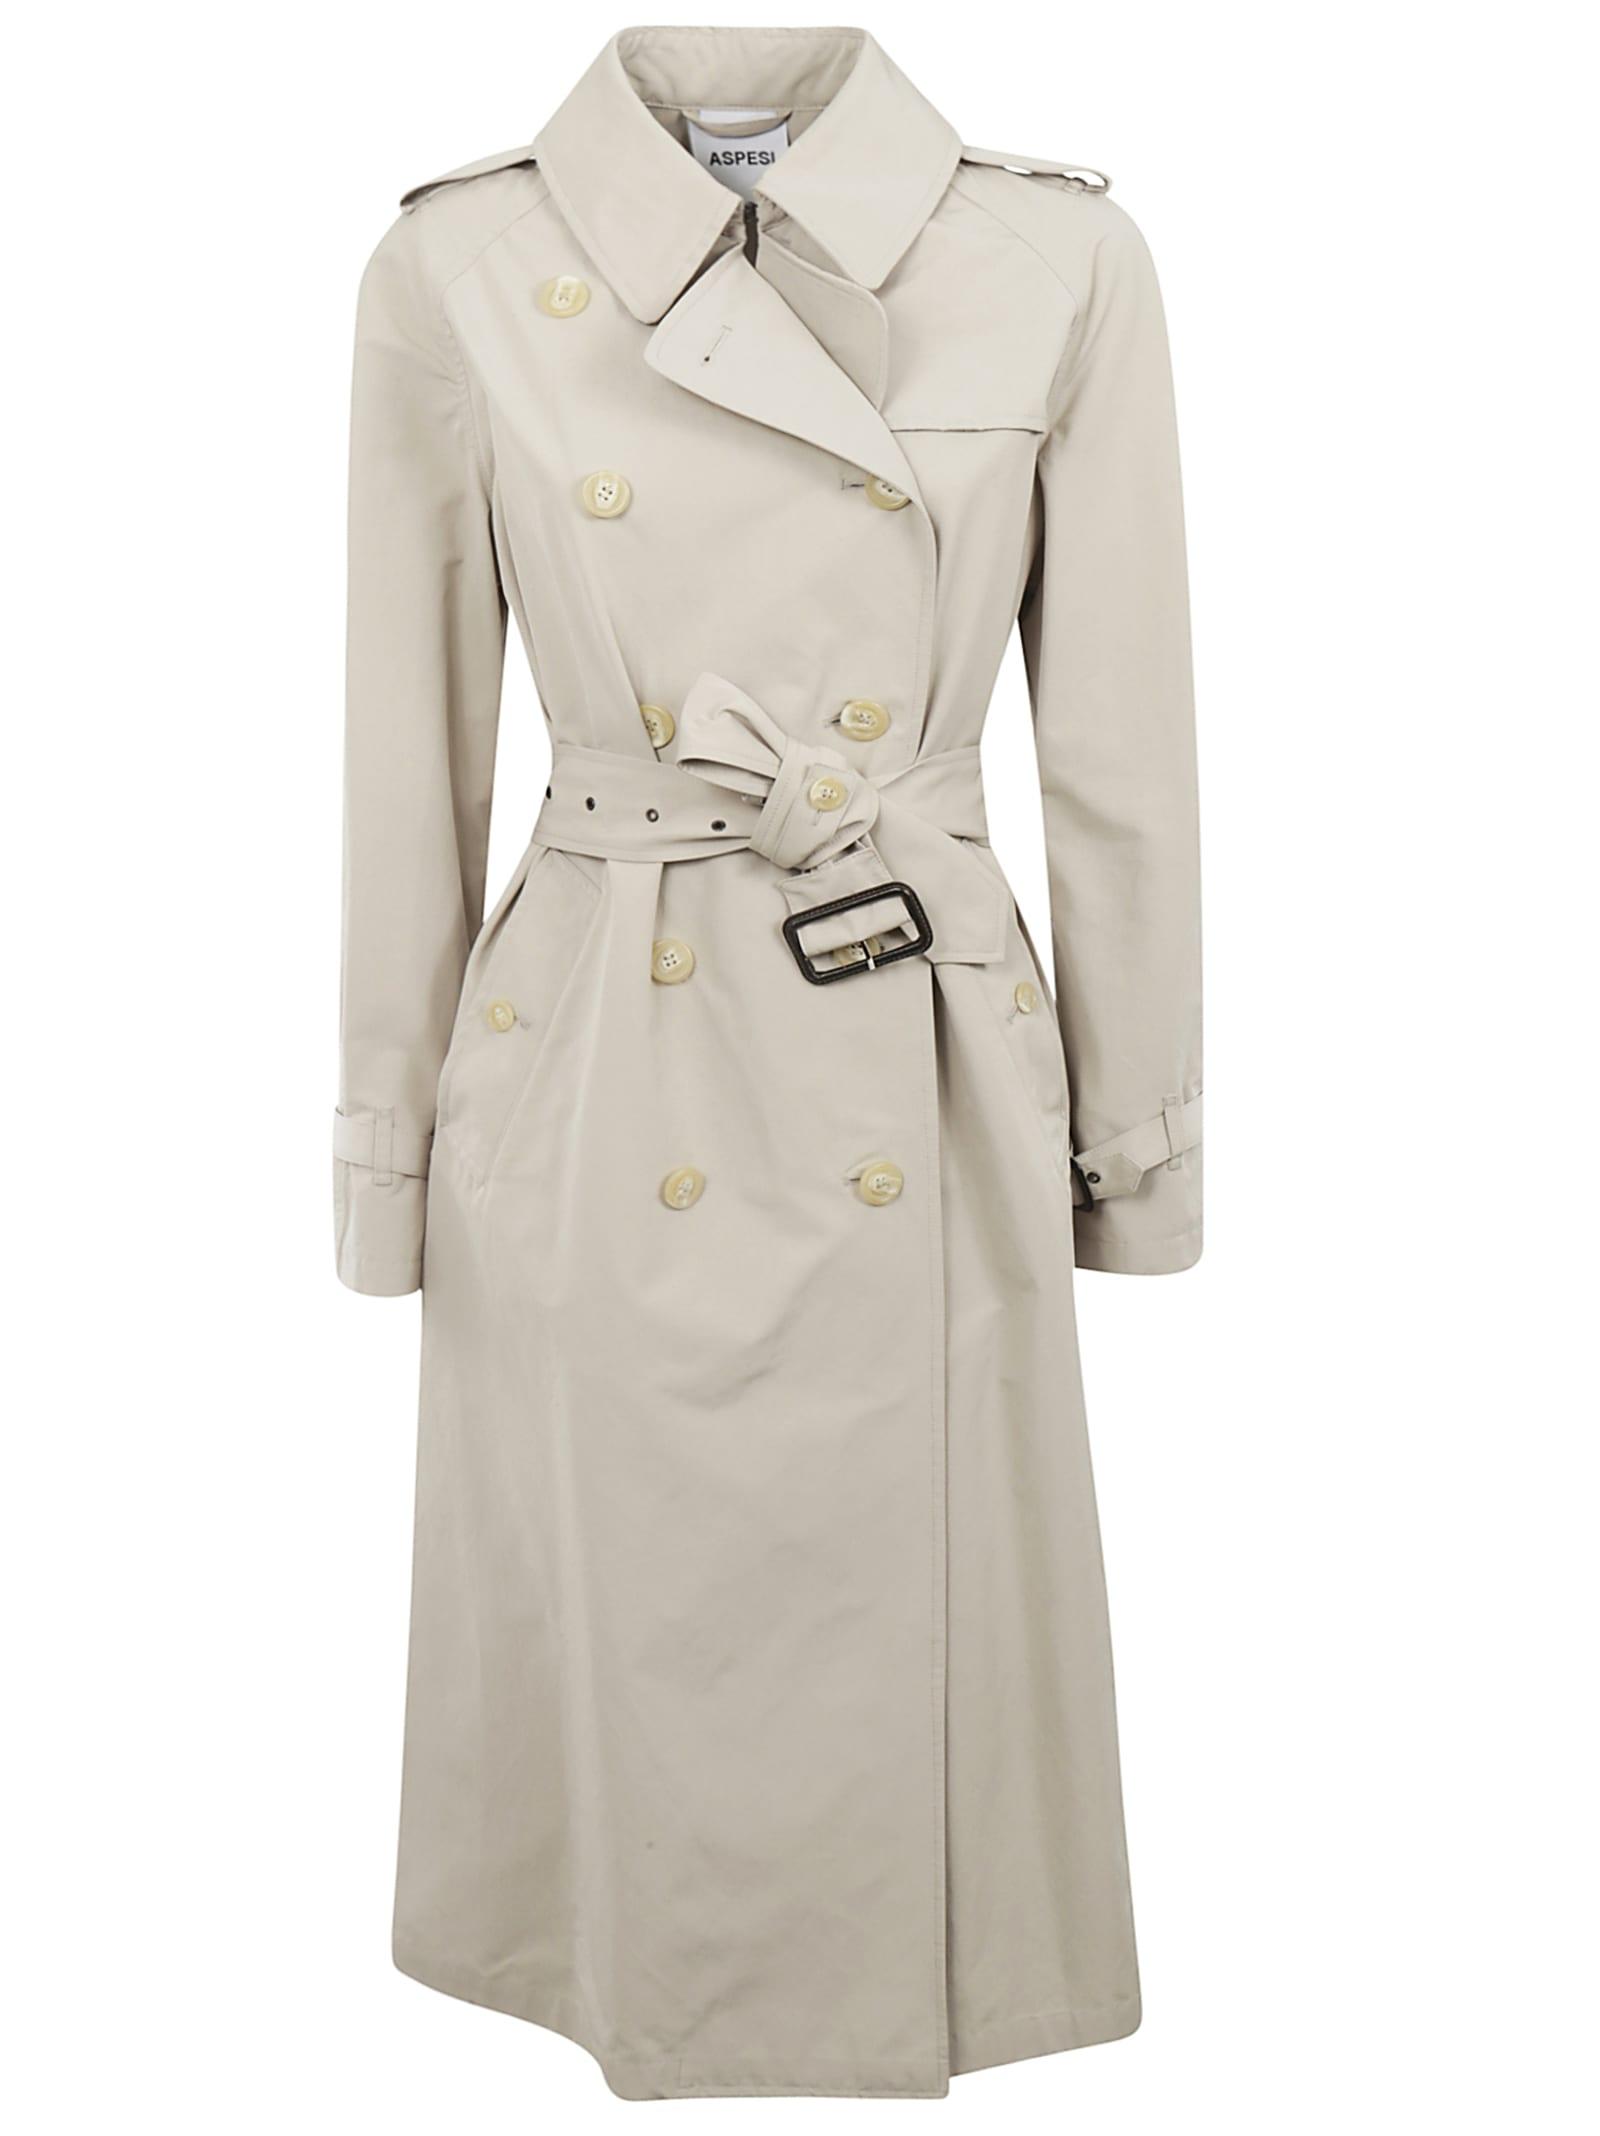 Photo of  Aspesi Classic Trench- shop Aspesi jackets online sales